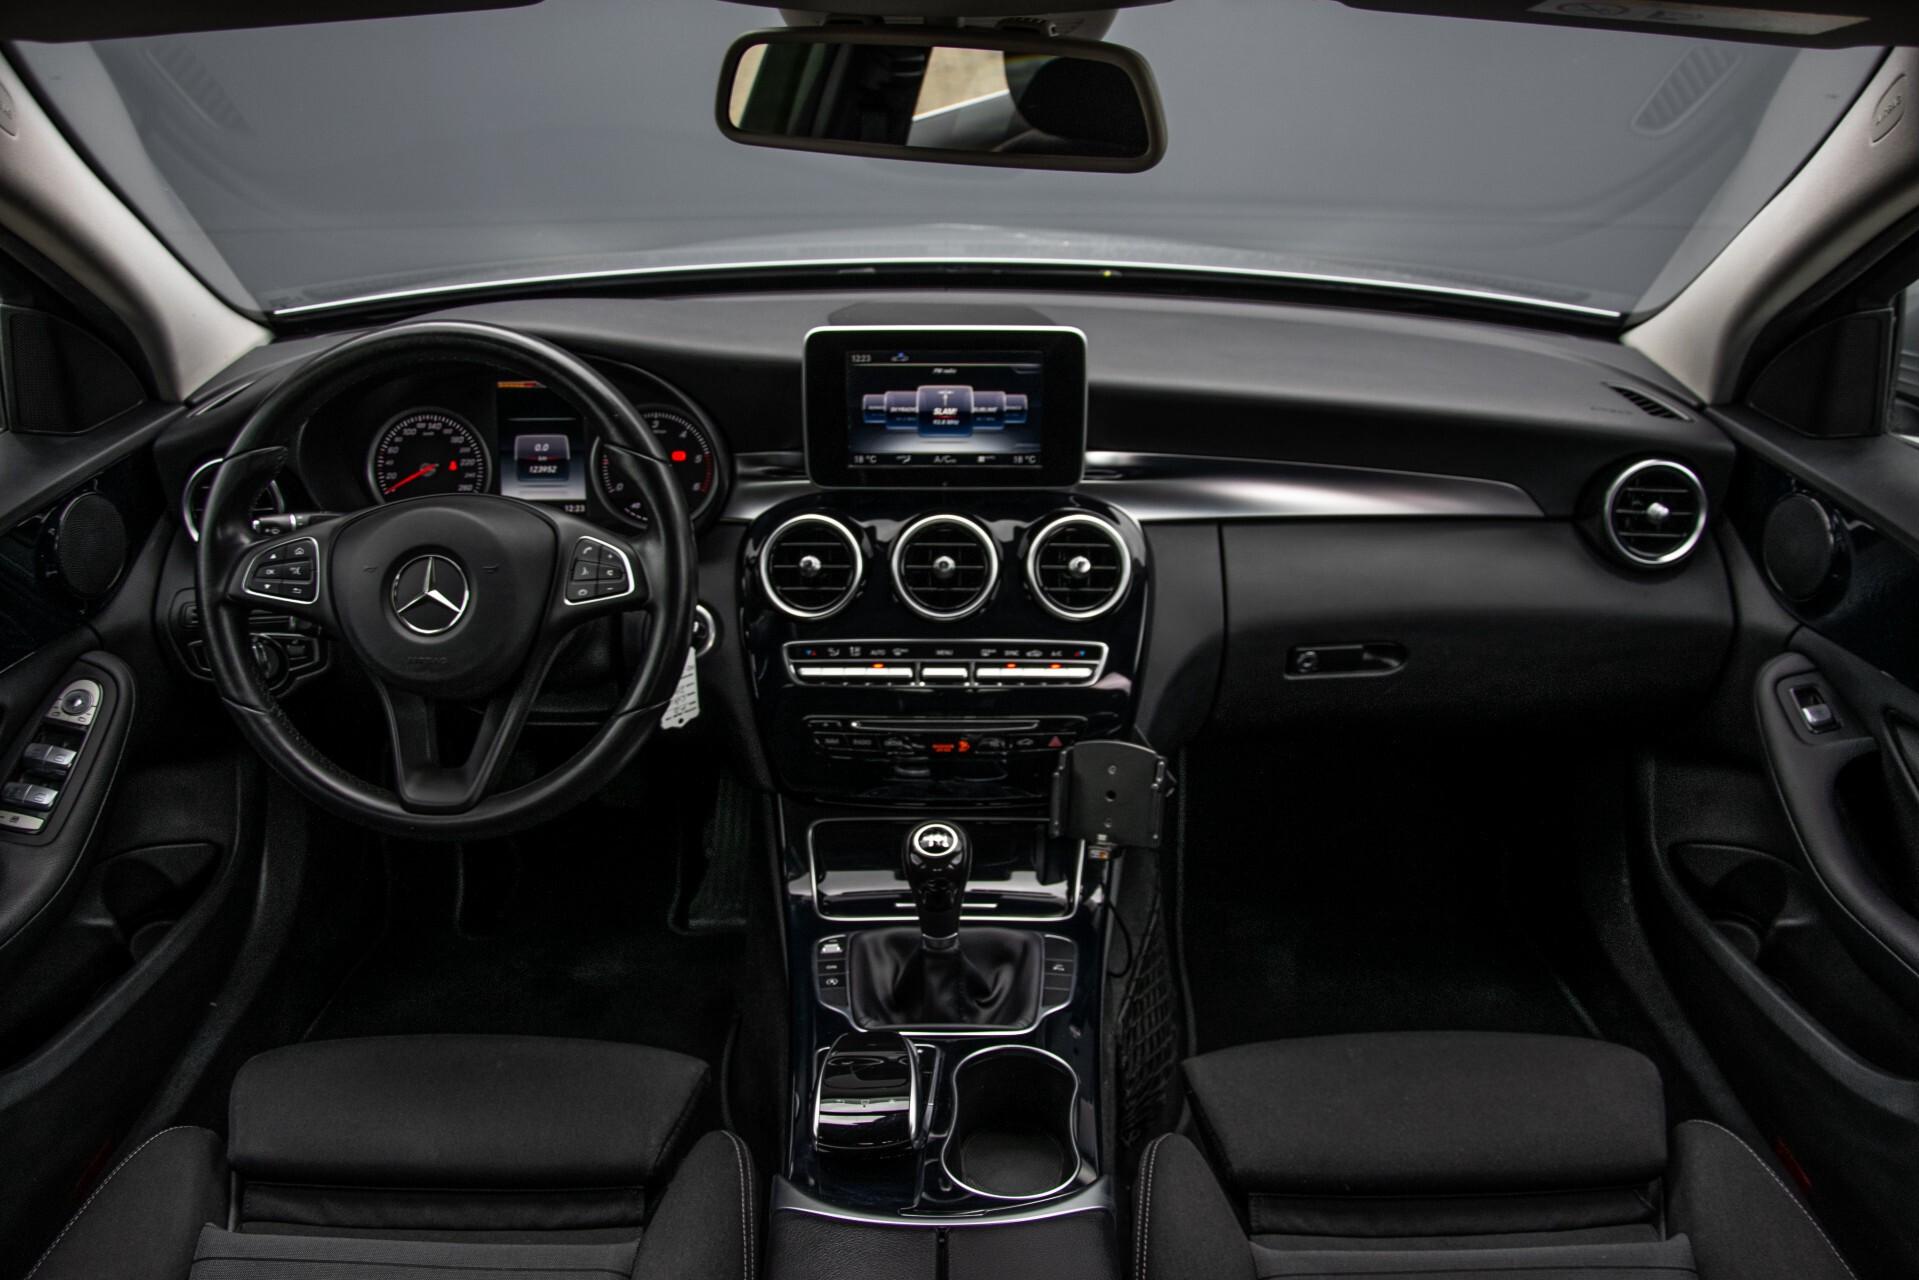 Mercedes-Benz C-Klasse 180 Bluetec Lease Edition Intelligent Light System/Cruise Control/Navi Foto 7